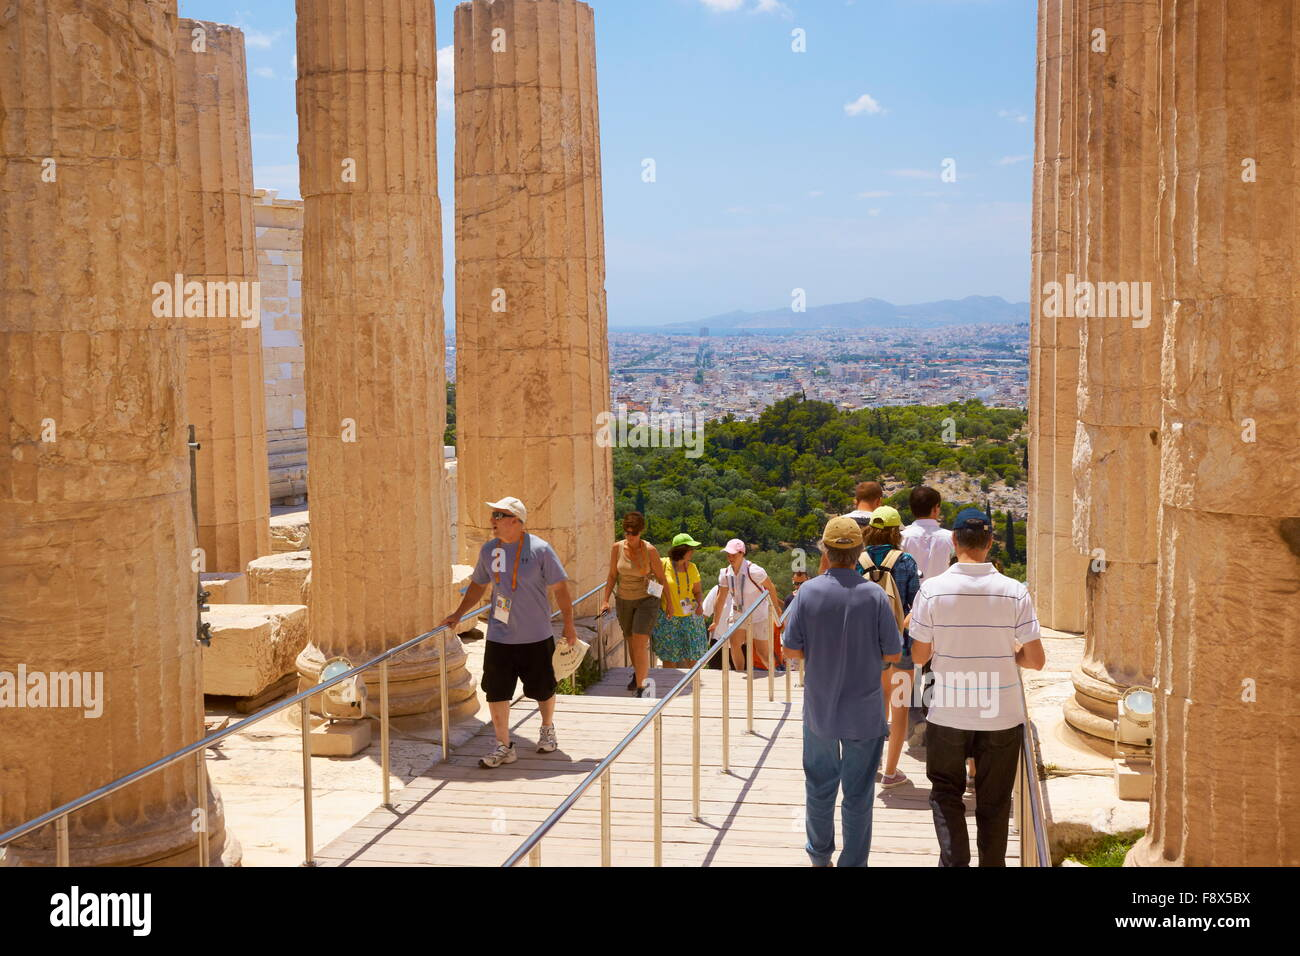 Athens - Acropolis, tourists in the passage through the Propylaea, Greece - Stock Image